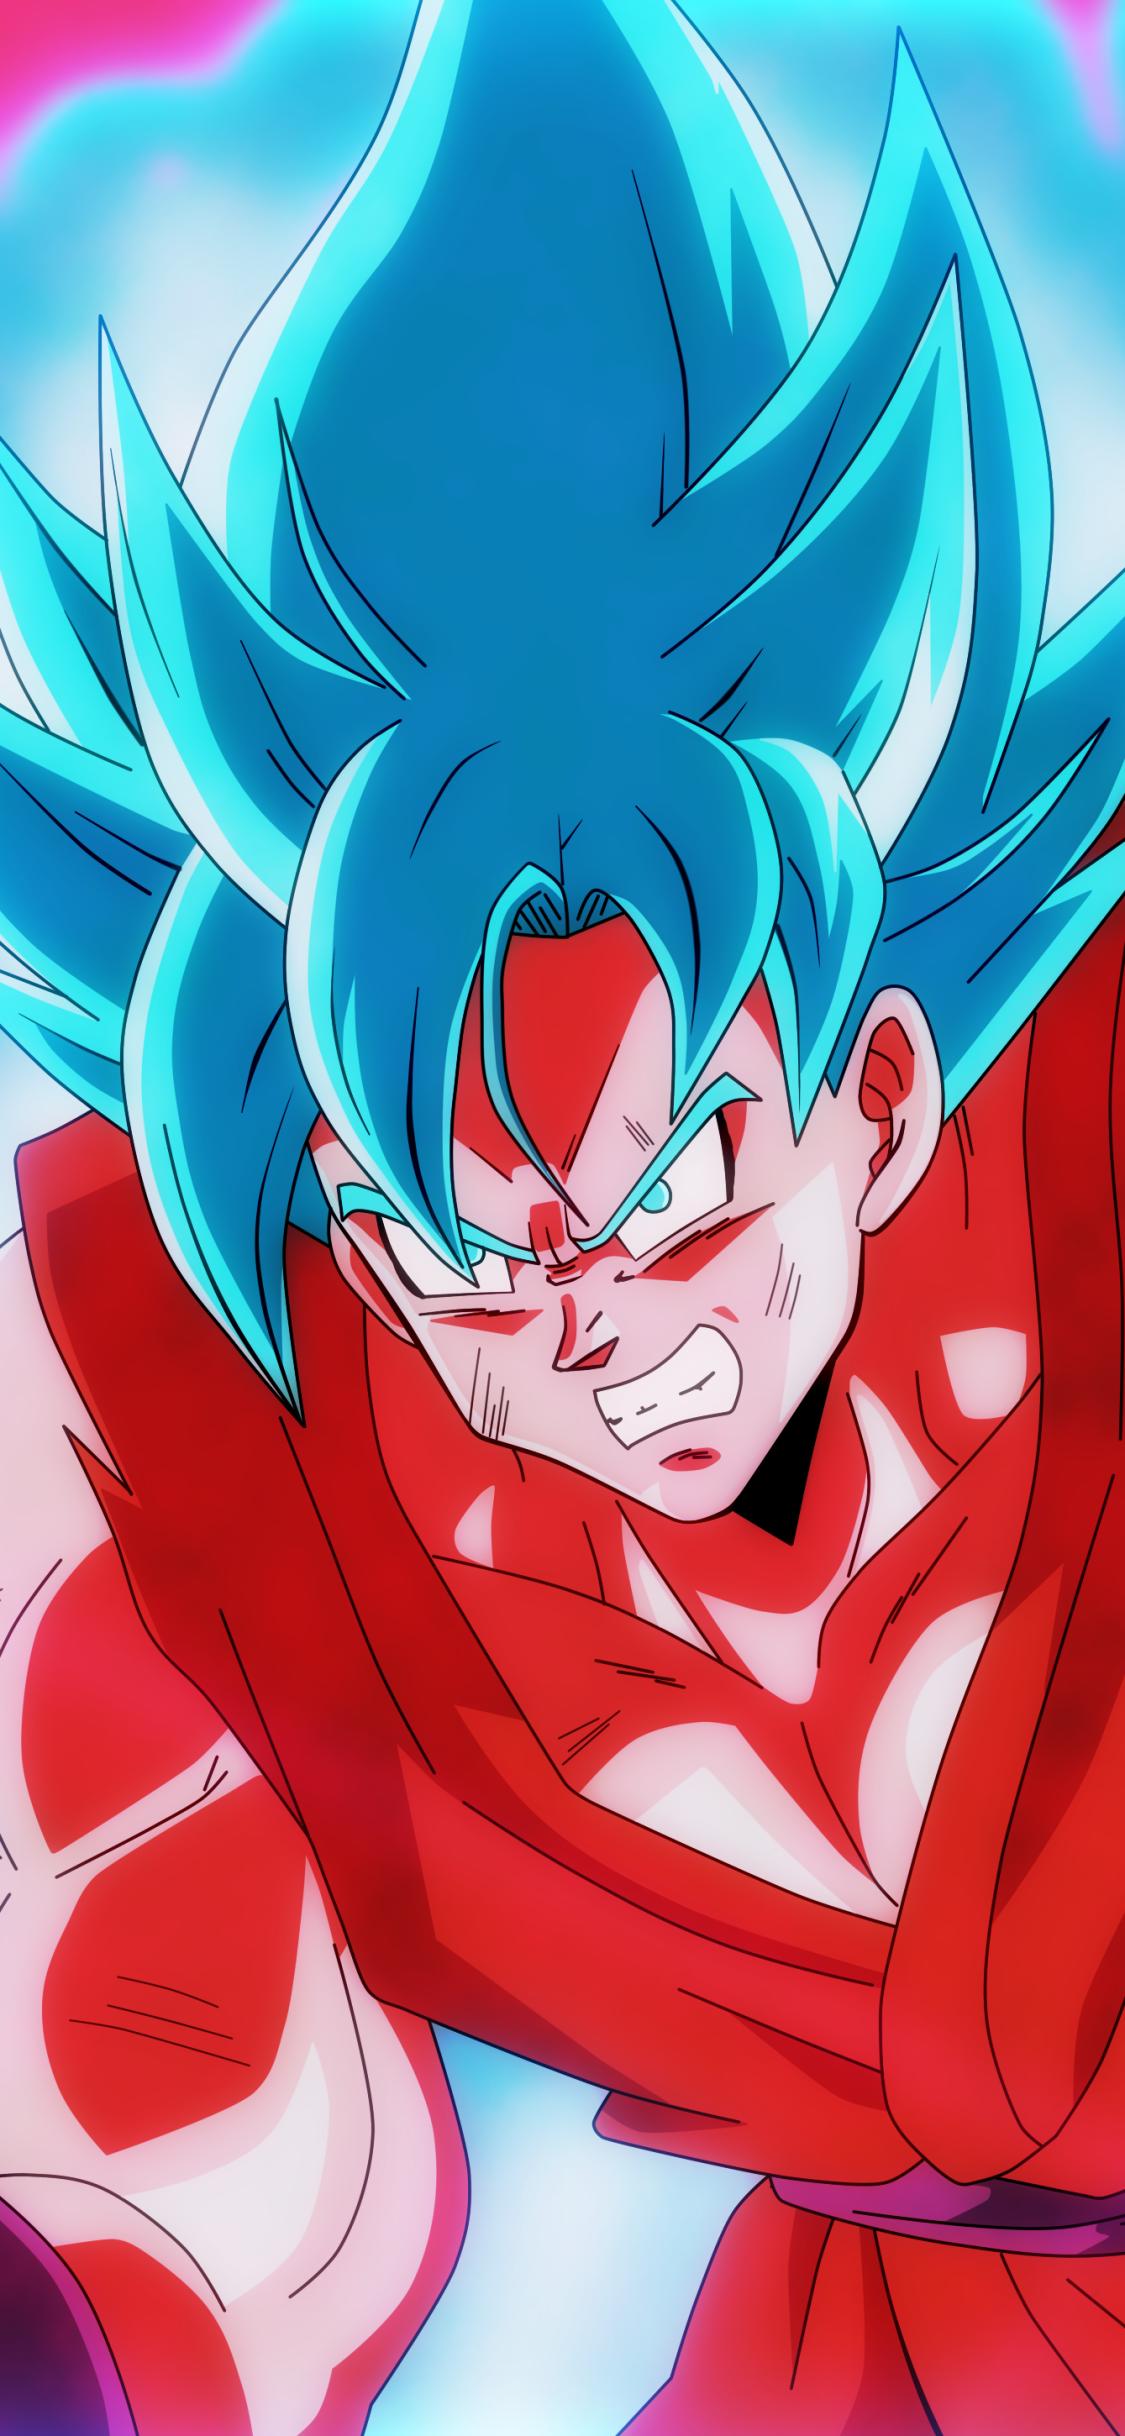 AnimeDragon Ball Super 1125x2436 Wallpaper ID 705954   Mobile 1125x2436